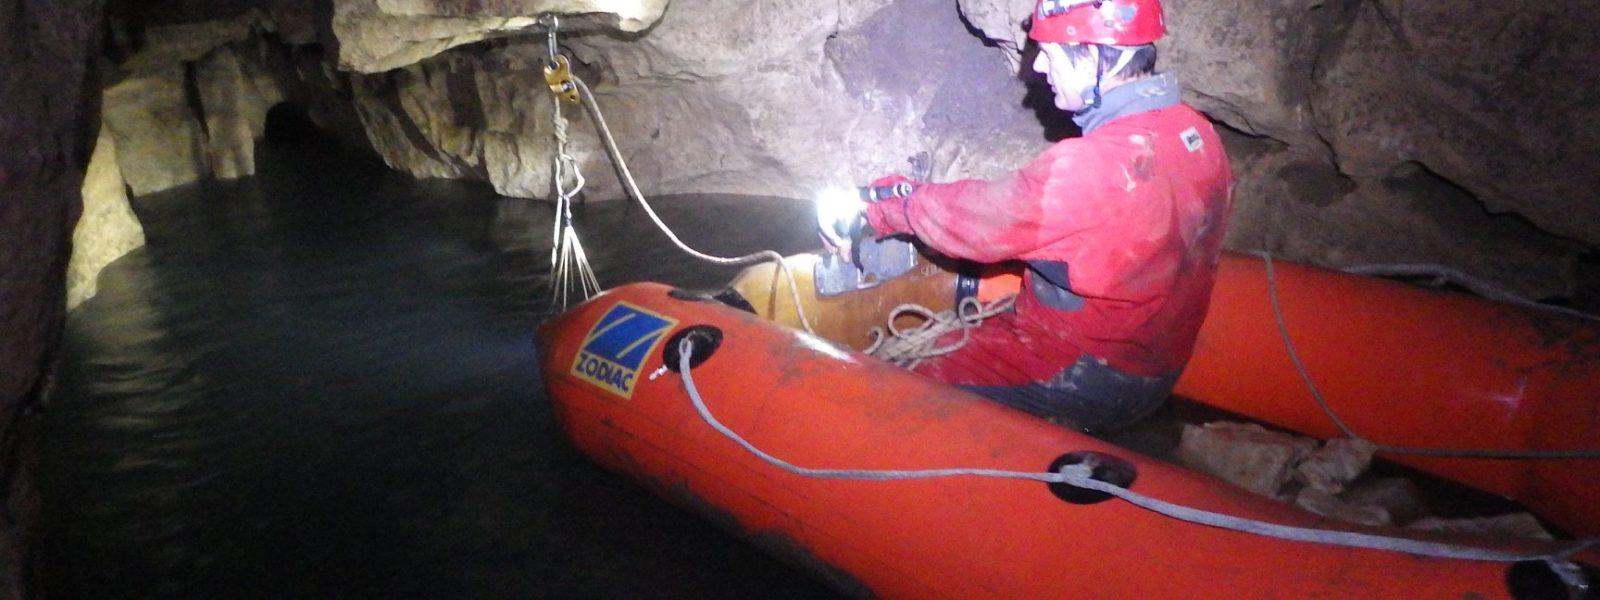 Plongée souterraine à la Roche-Ruffin le 1 mai 2018